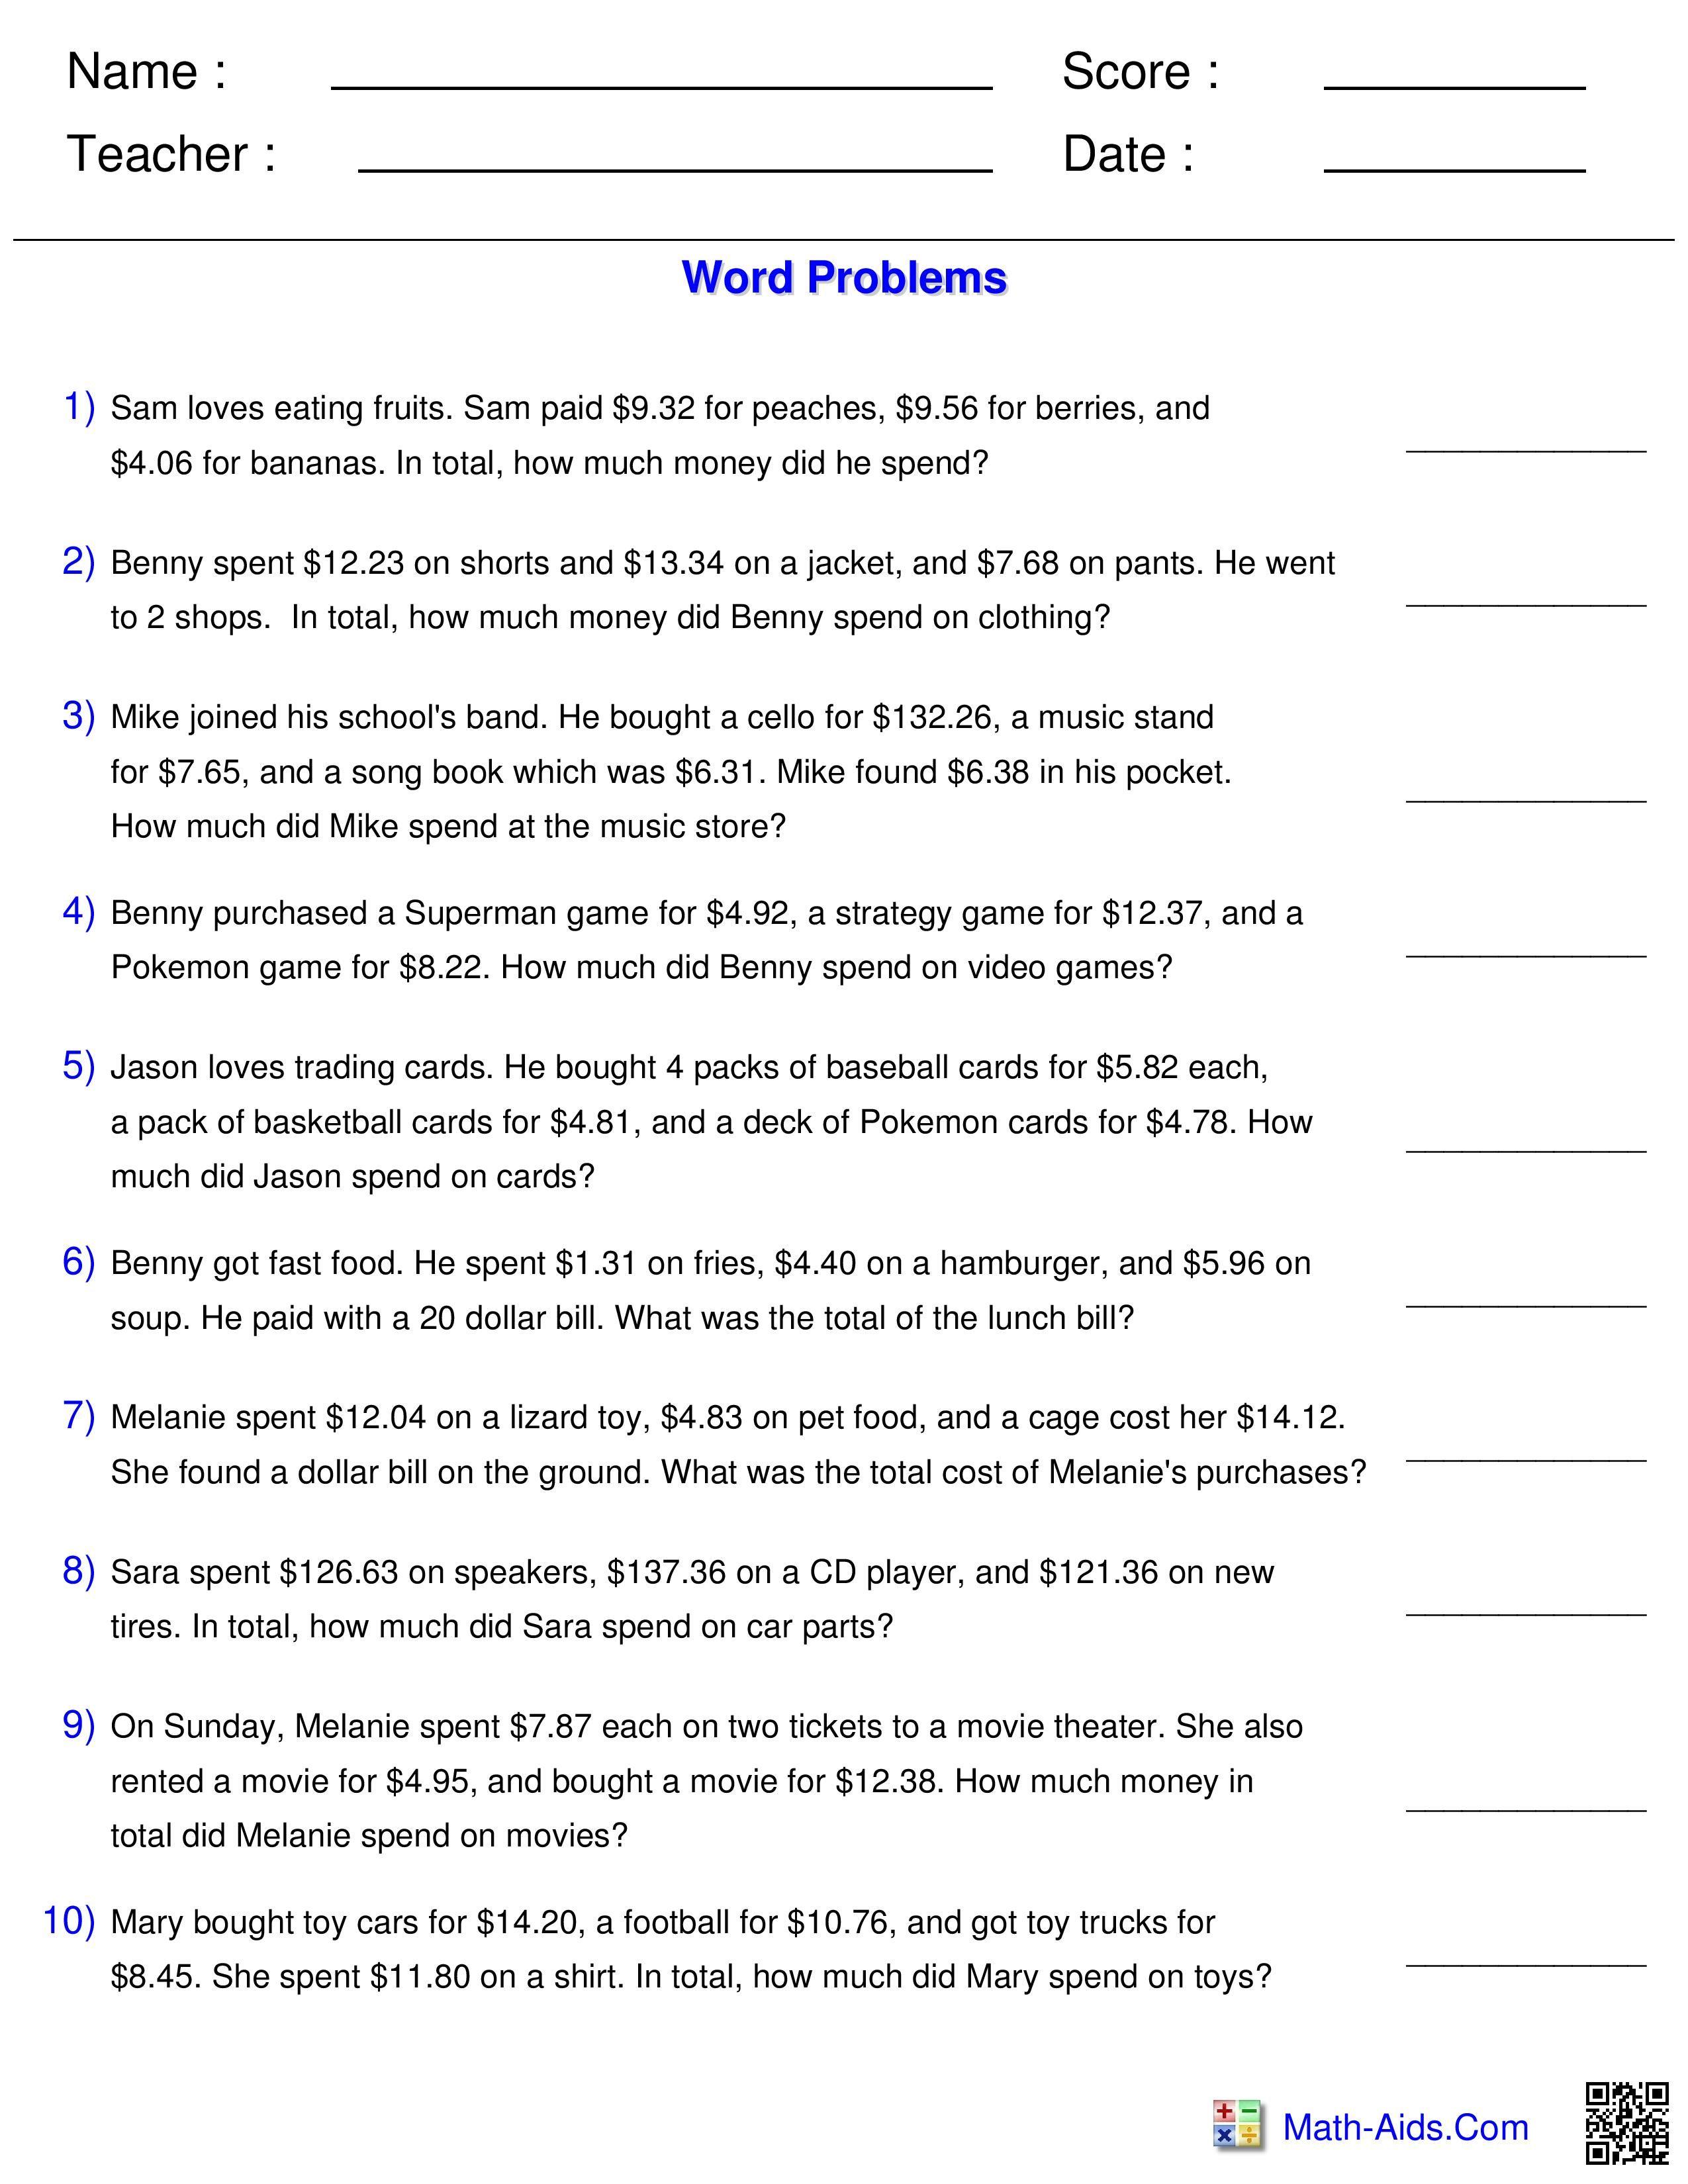 Best 20 Money Worksheets You Calendars Https Www Youcalendars Com Money Worksheets Html Word Problem Worksheets Word Problems Math Words Estimation word problems worksheets